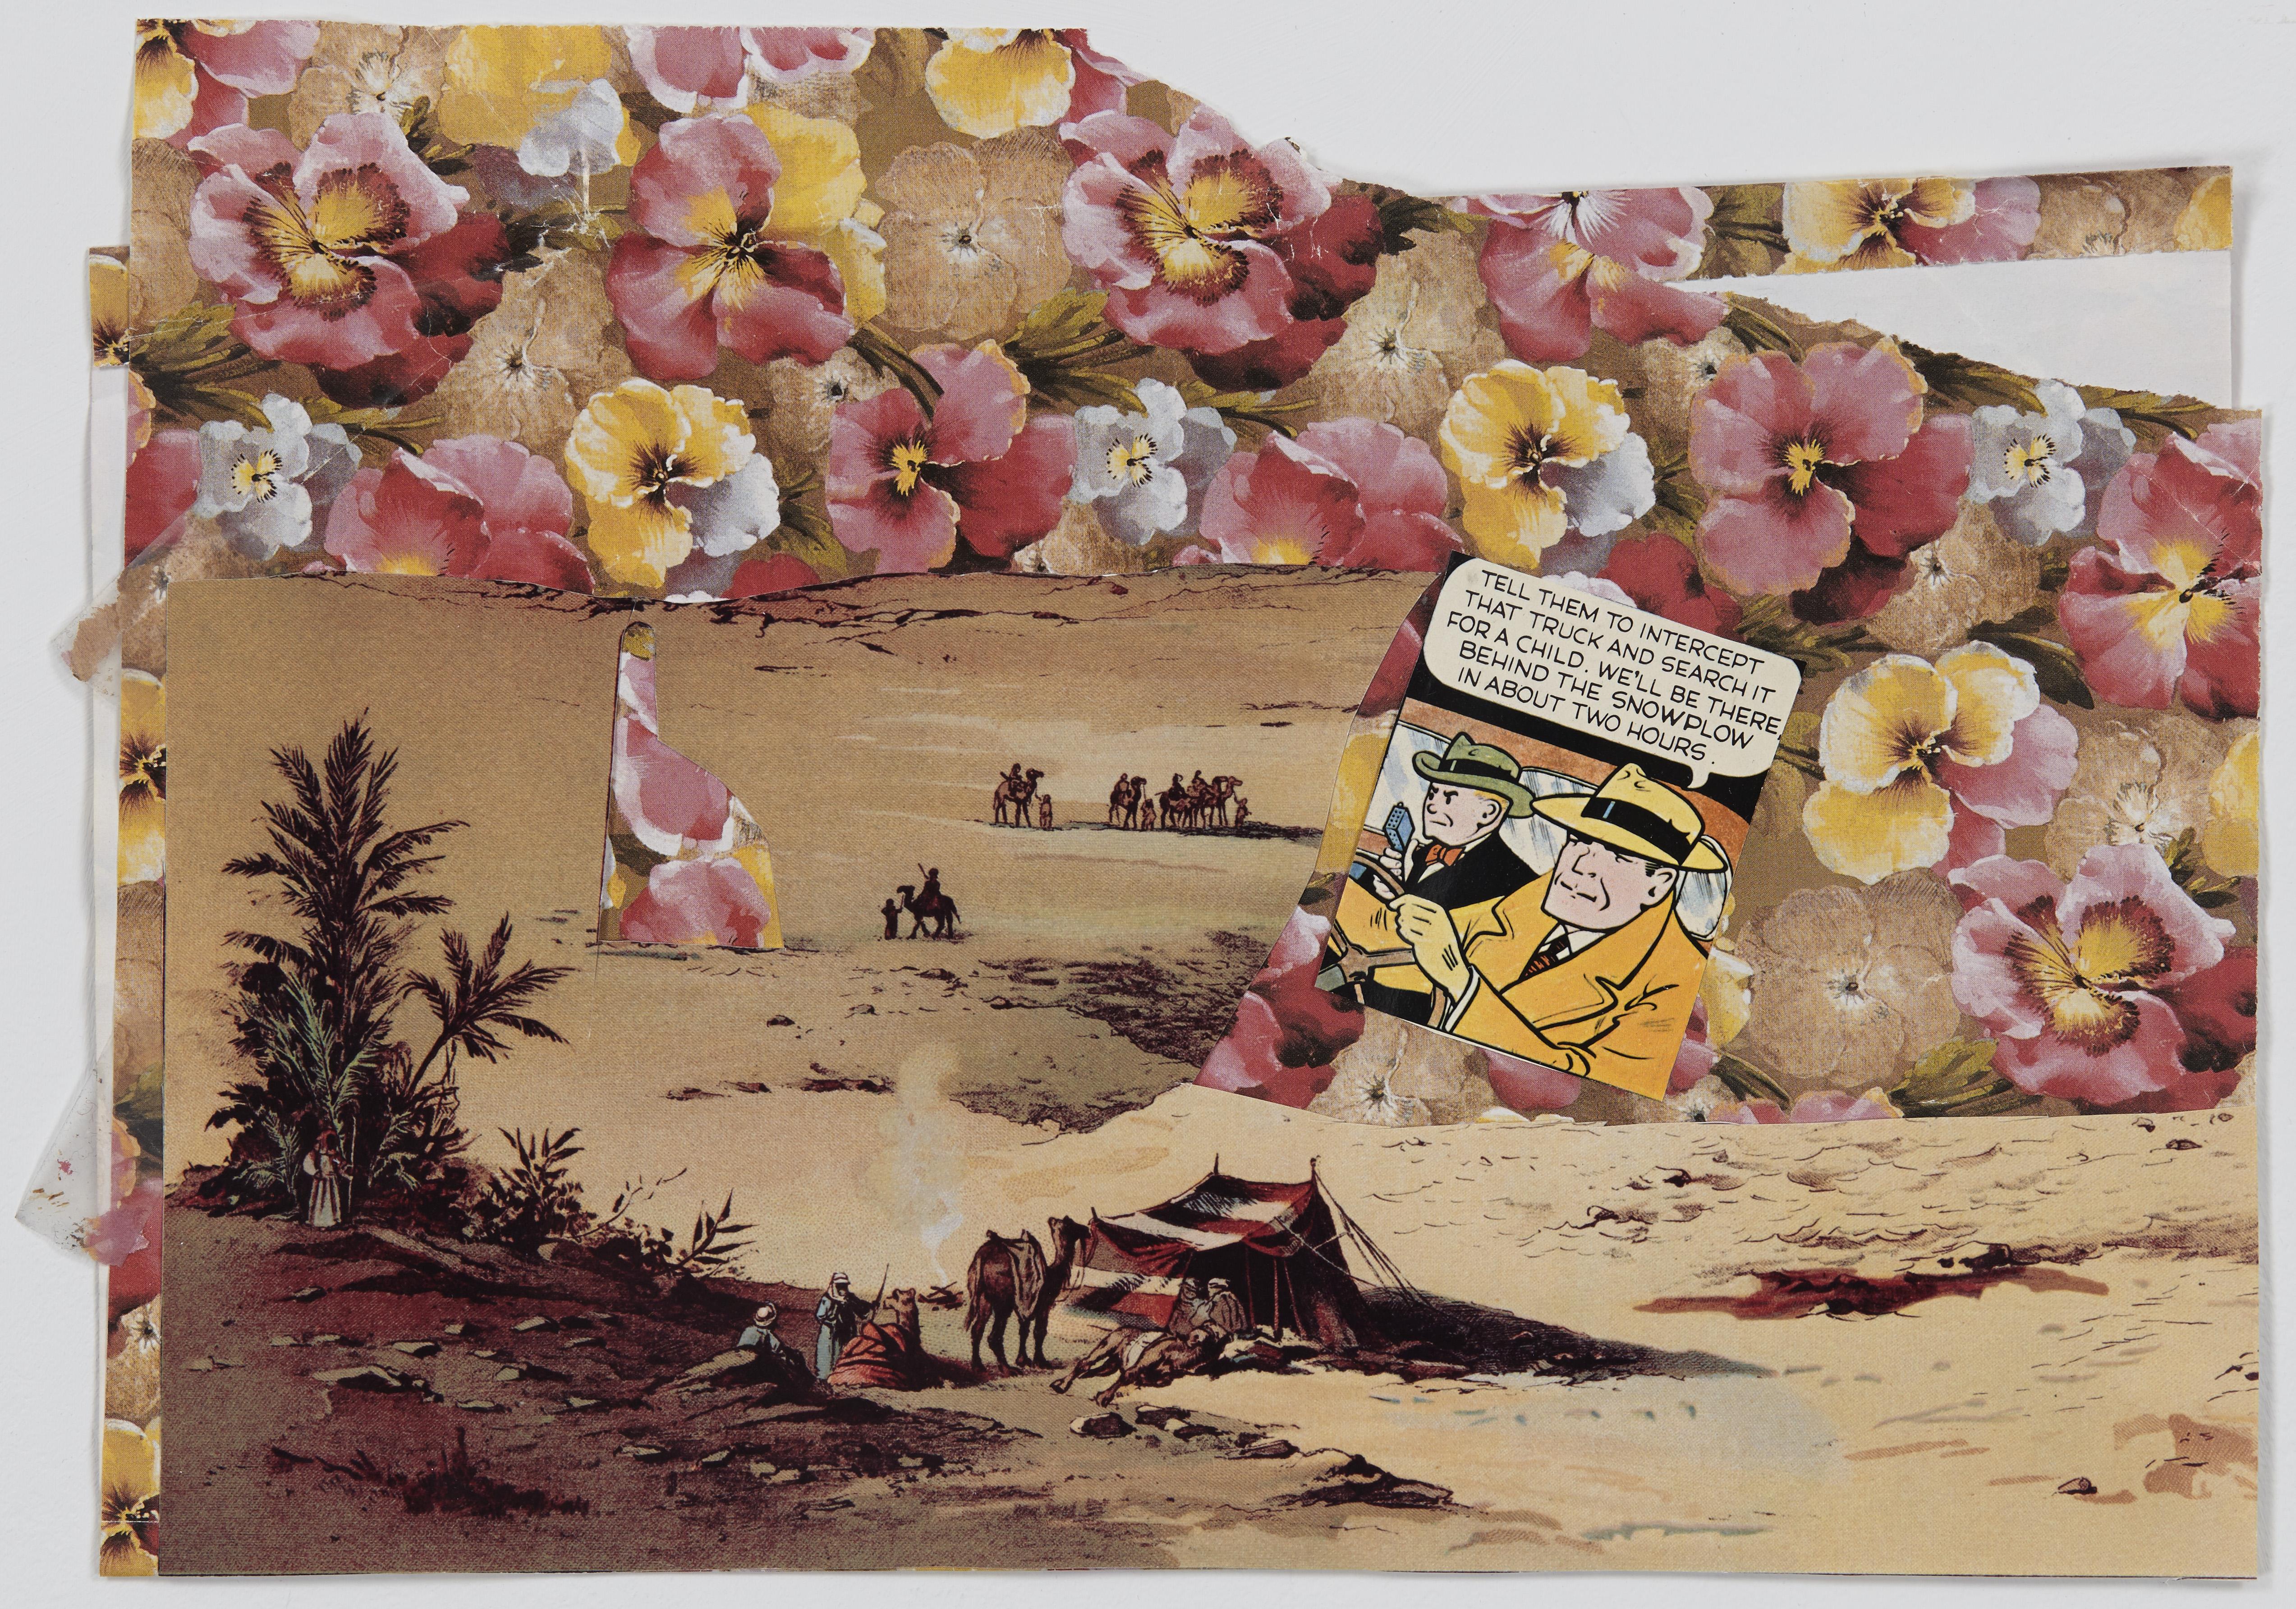 Ashbery_Desert Flowers_2014_collage_9.75x14in_300dpi